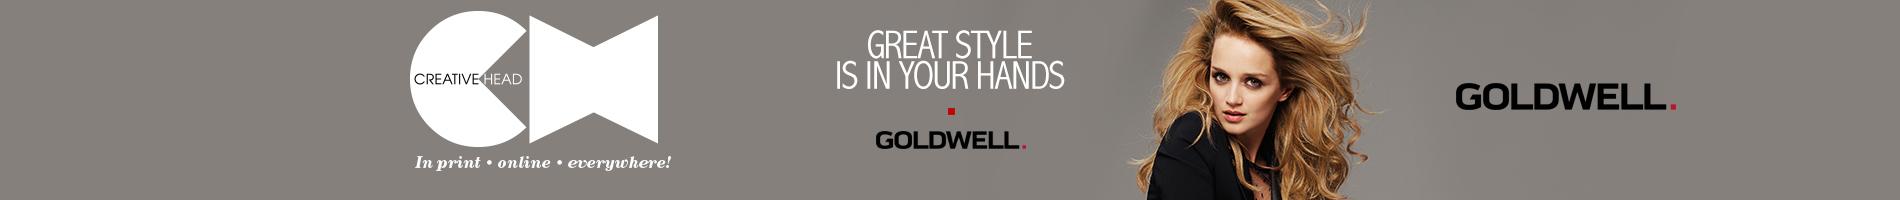 GoldwellStyleSign_Main